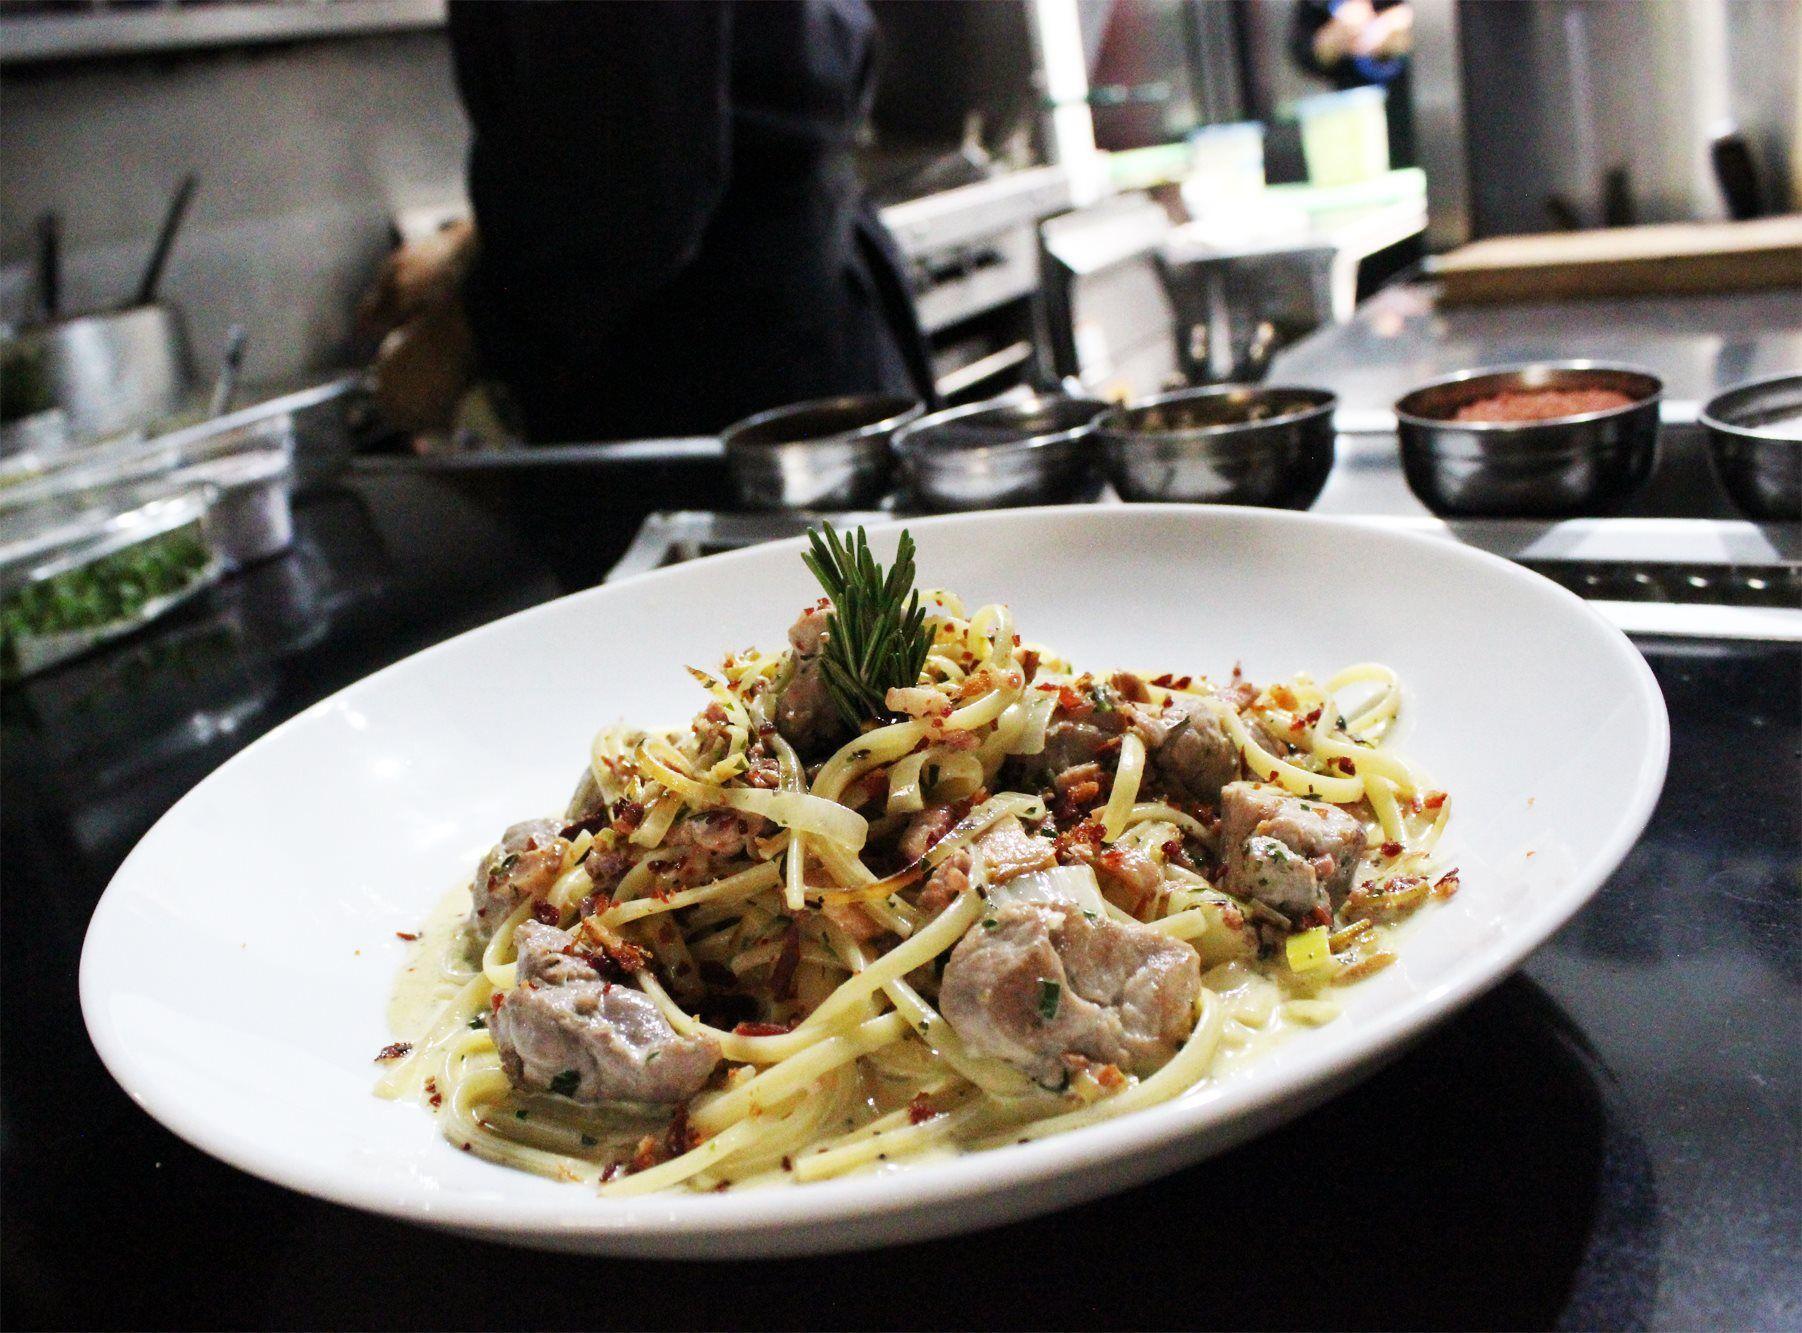 Los esperamos! #DDW #SuTerceraCasa daniel.com.co/menus | Reservas: 2493404 #pasta #bogota #kitchen